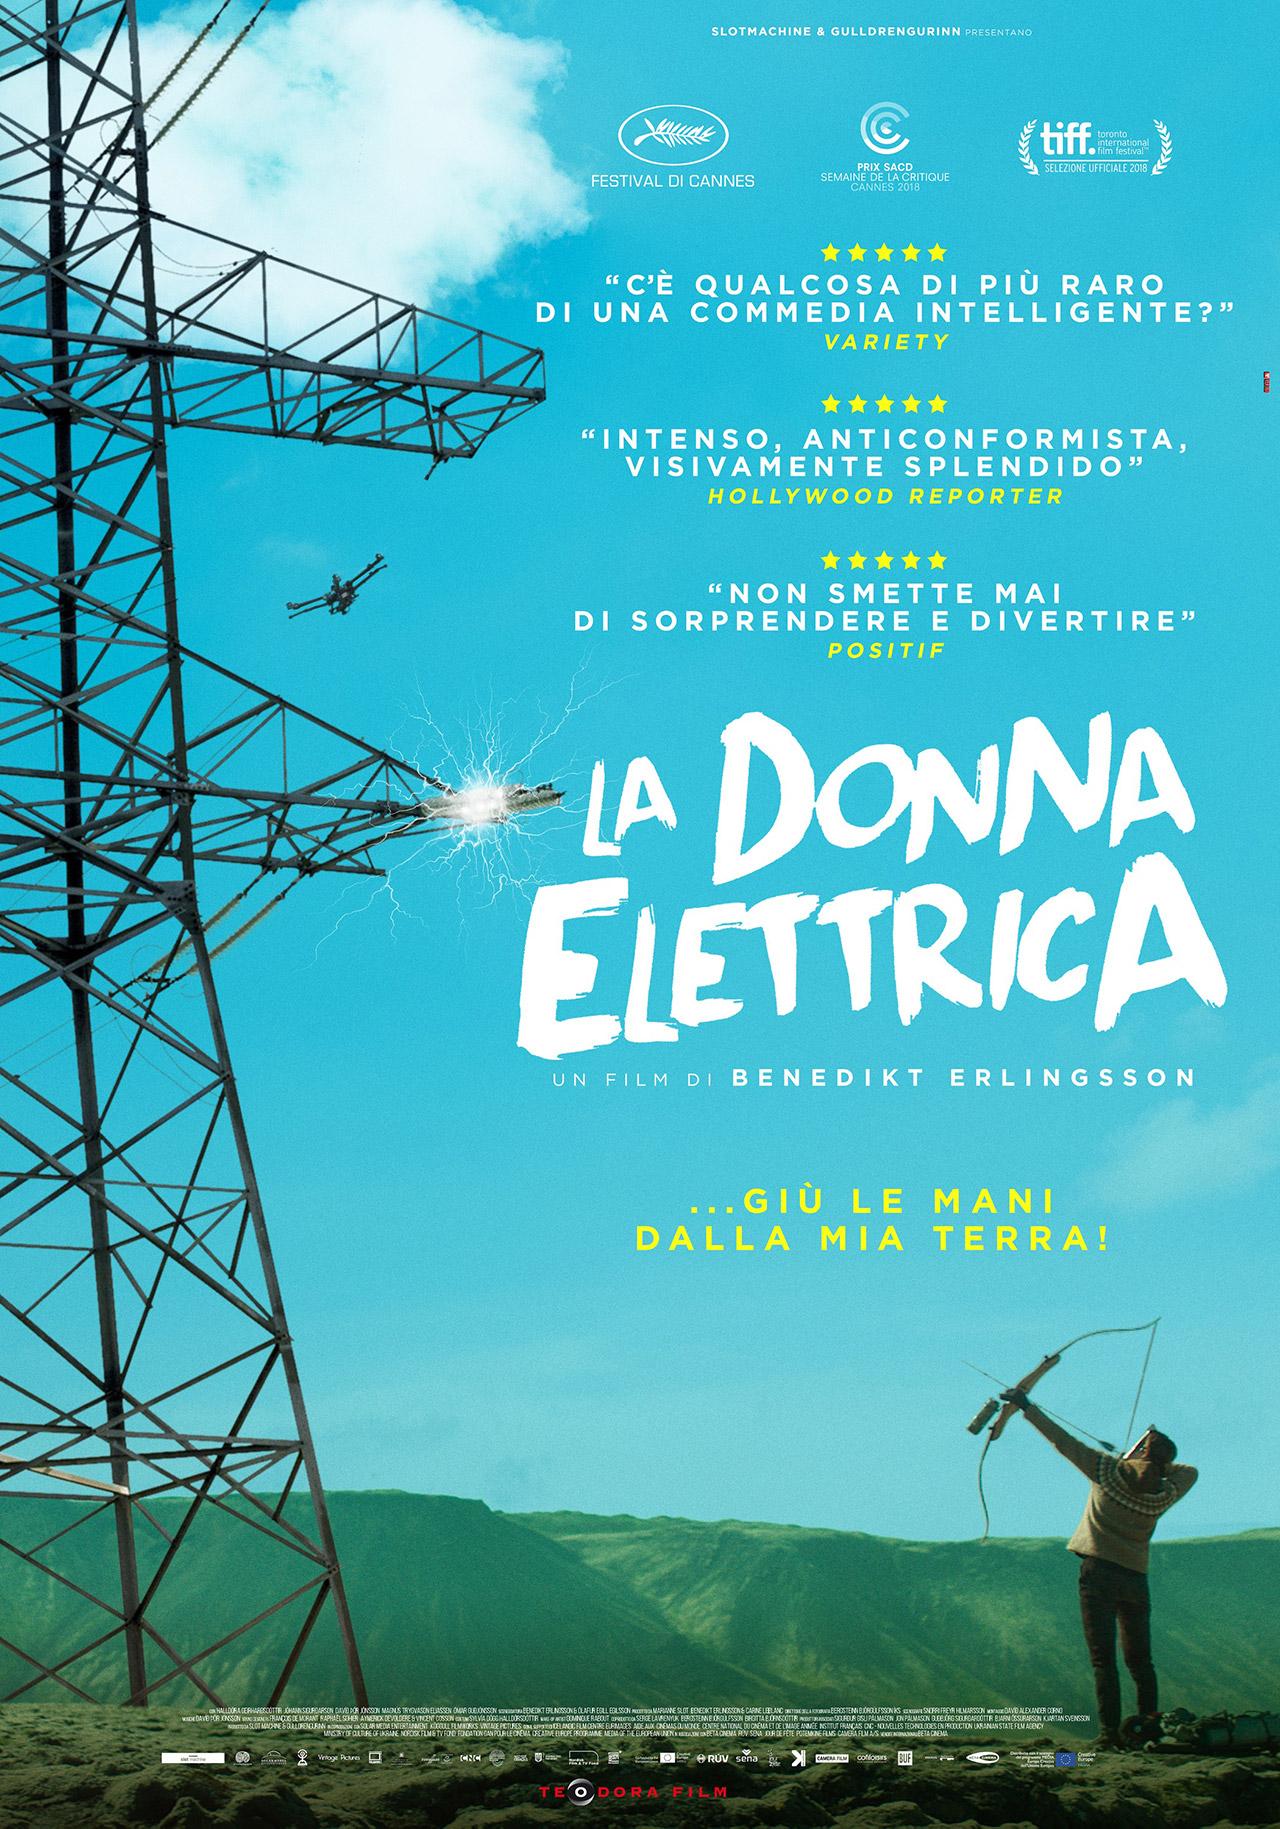 La donna elettrica  - Benedikt Erlingsson